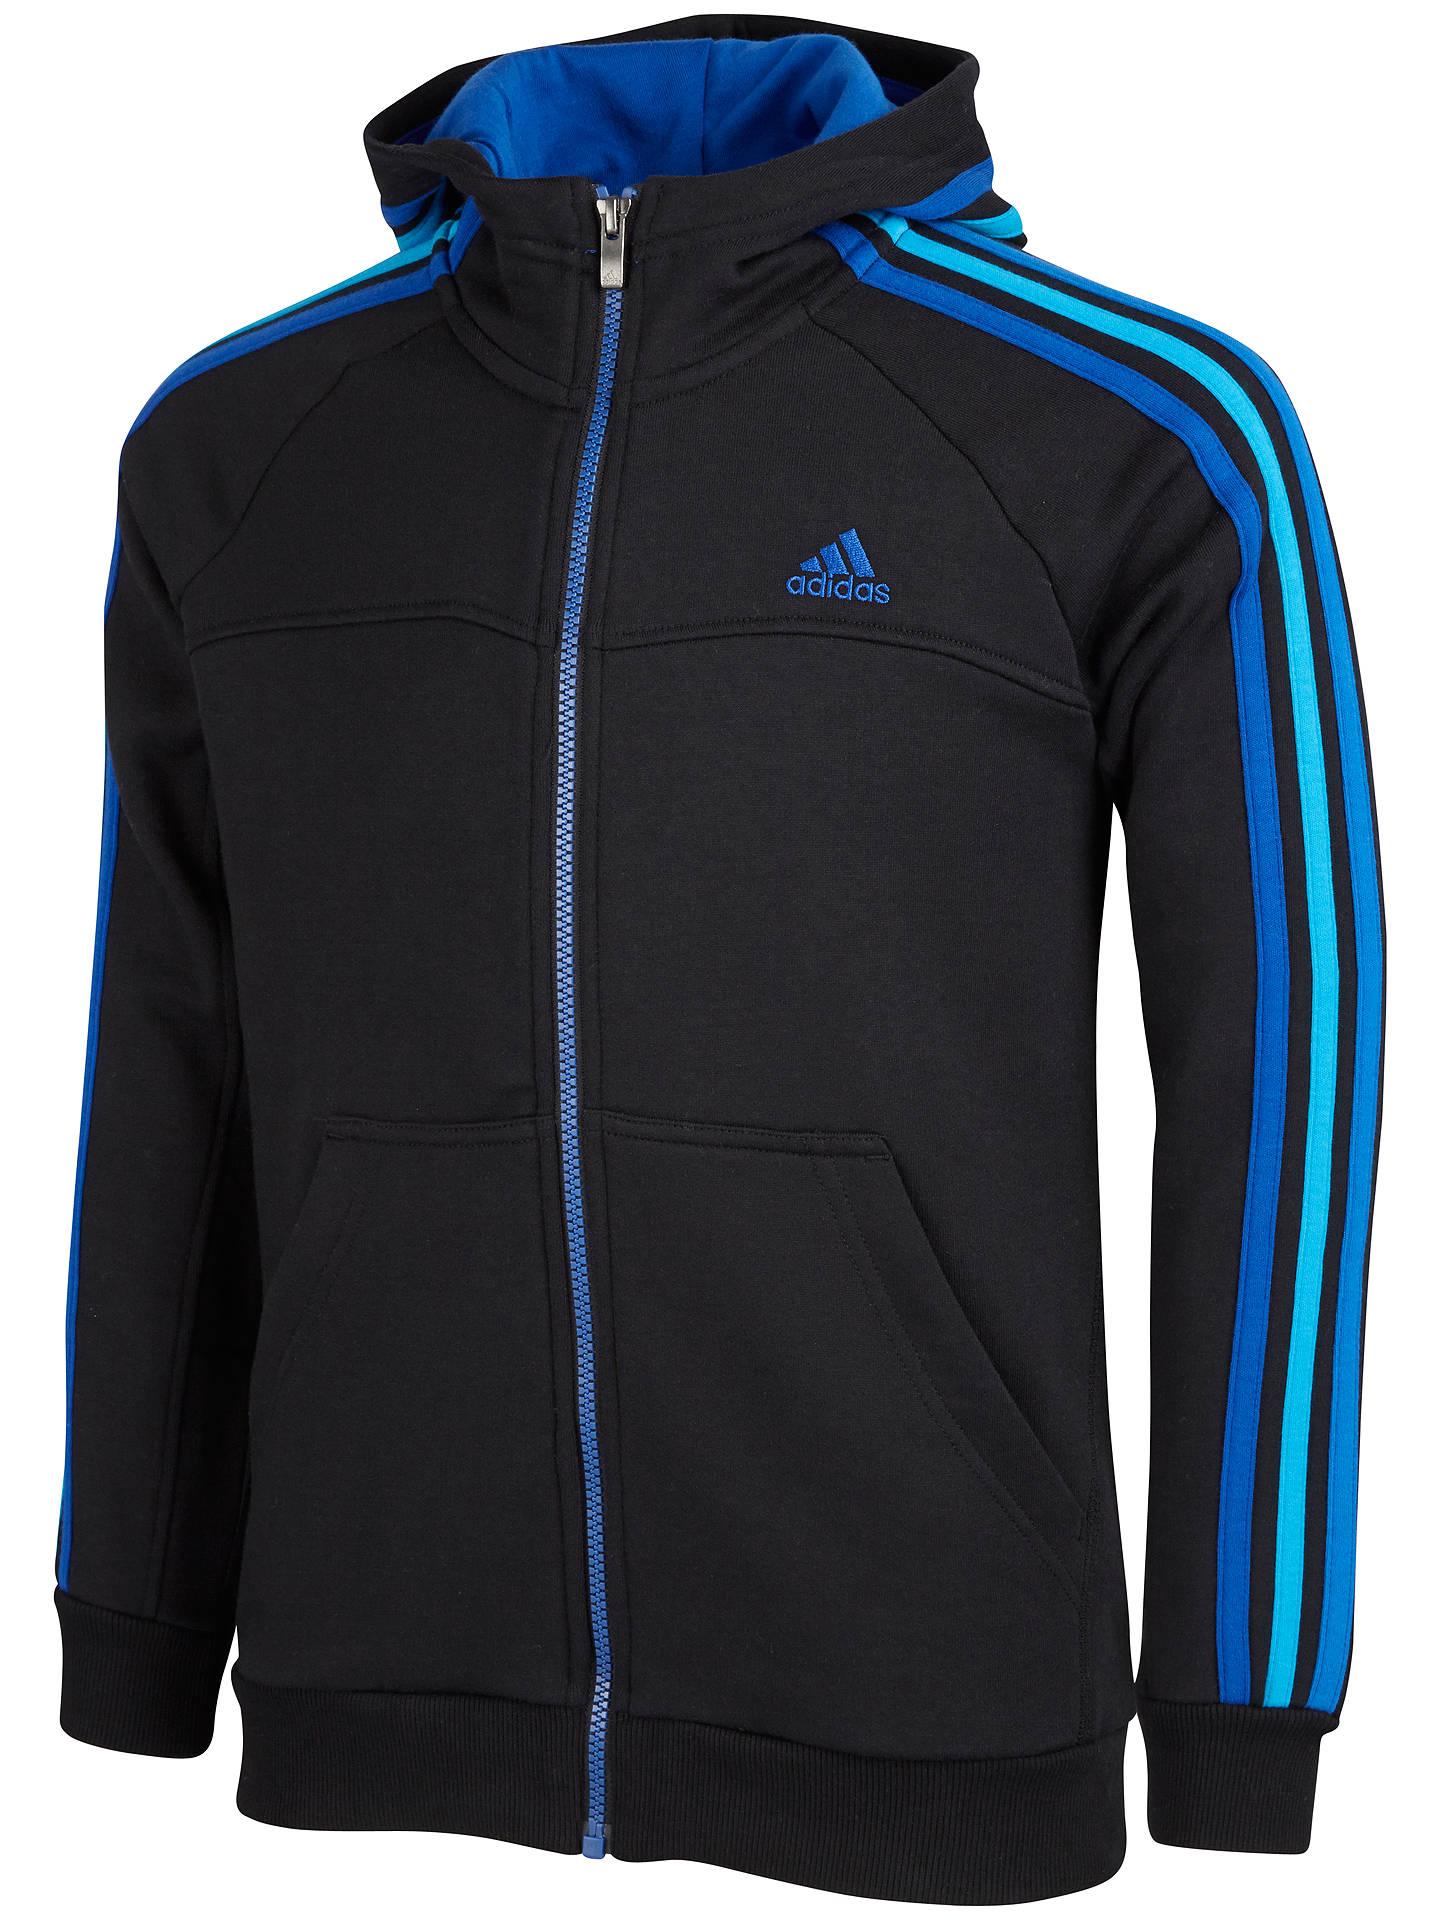 40747635 Adidas Boy's Essentials 3 Stripes Full-Zip Hoodie, Black/Blue at ...